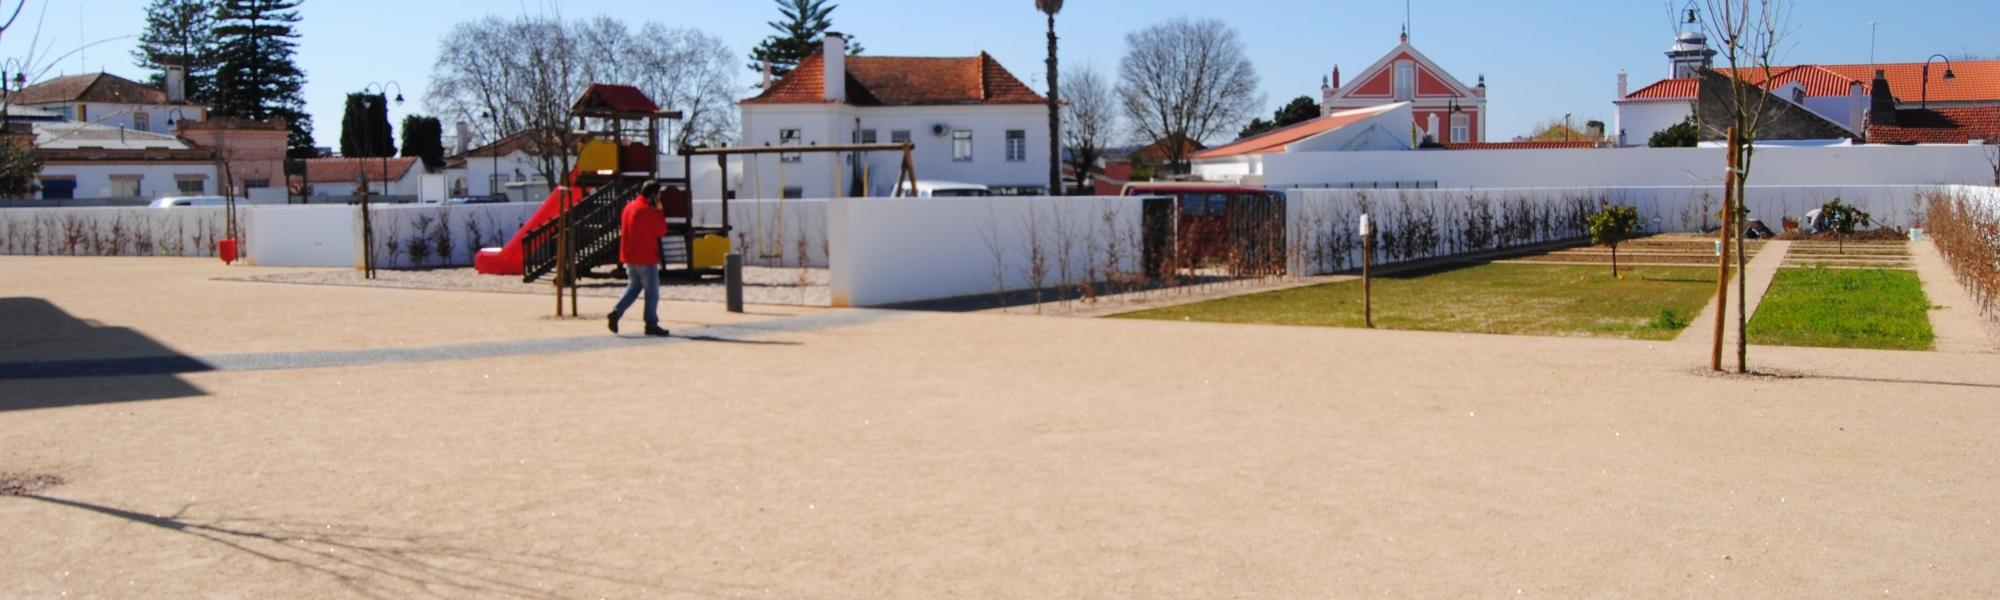 Platz HG Portugal